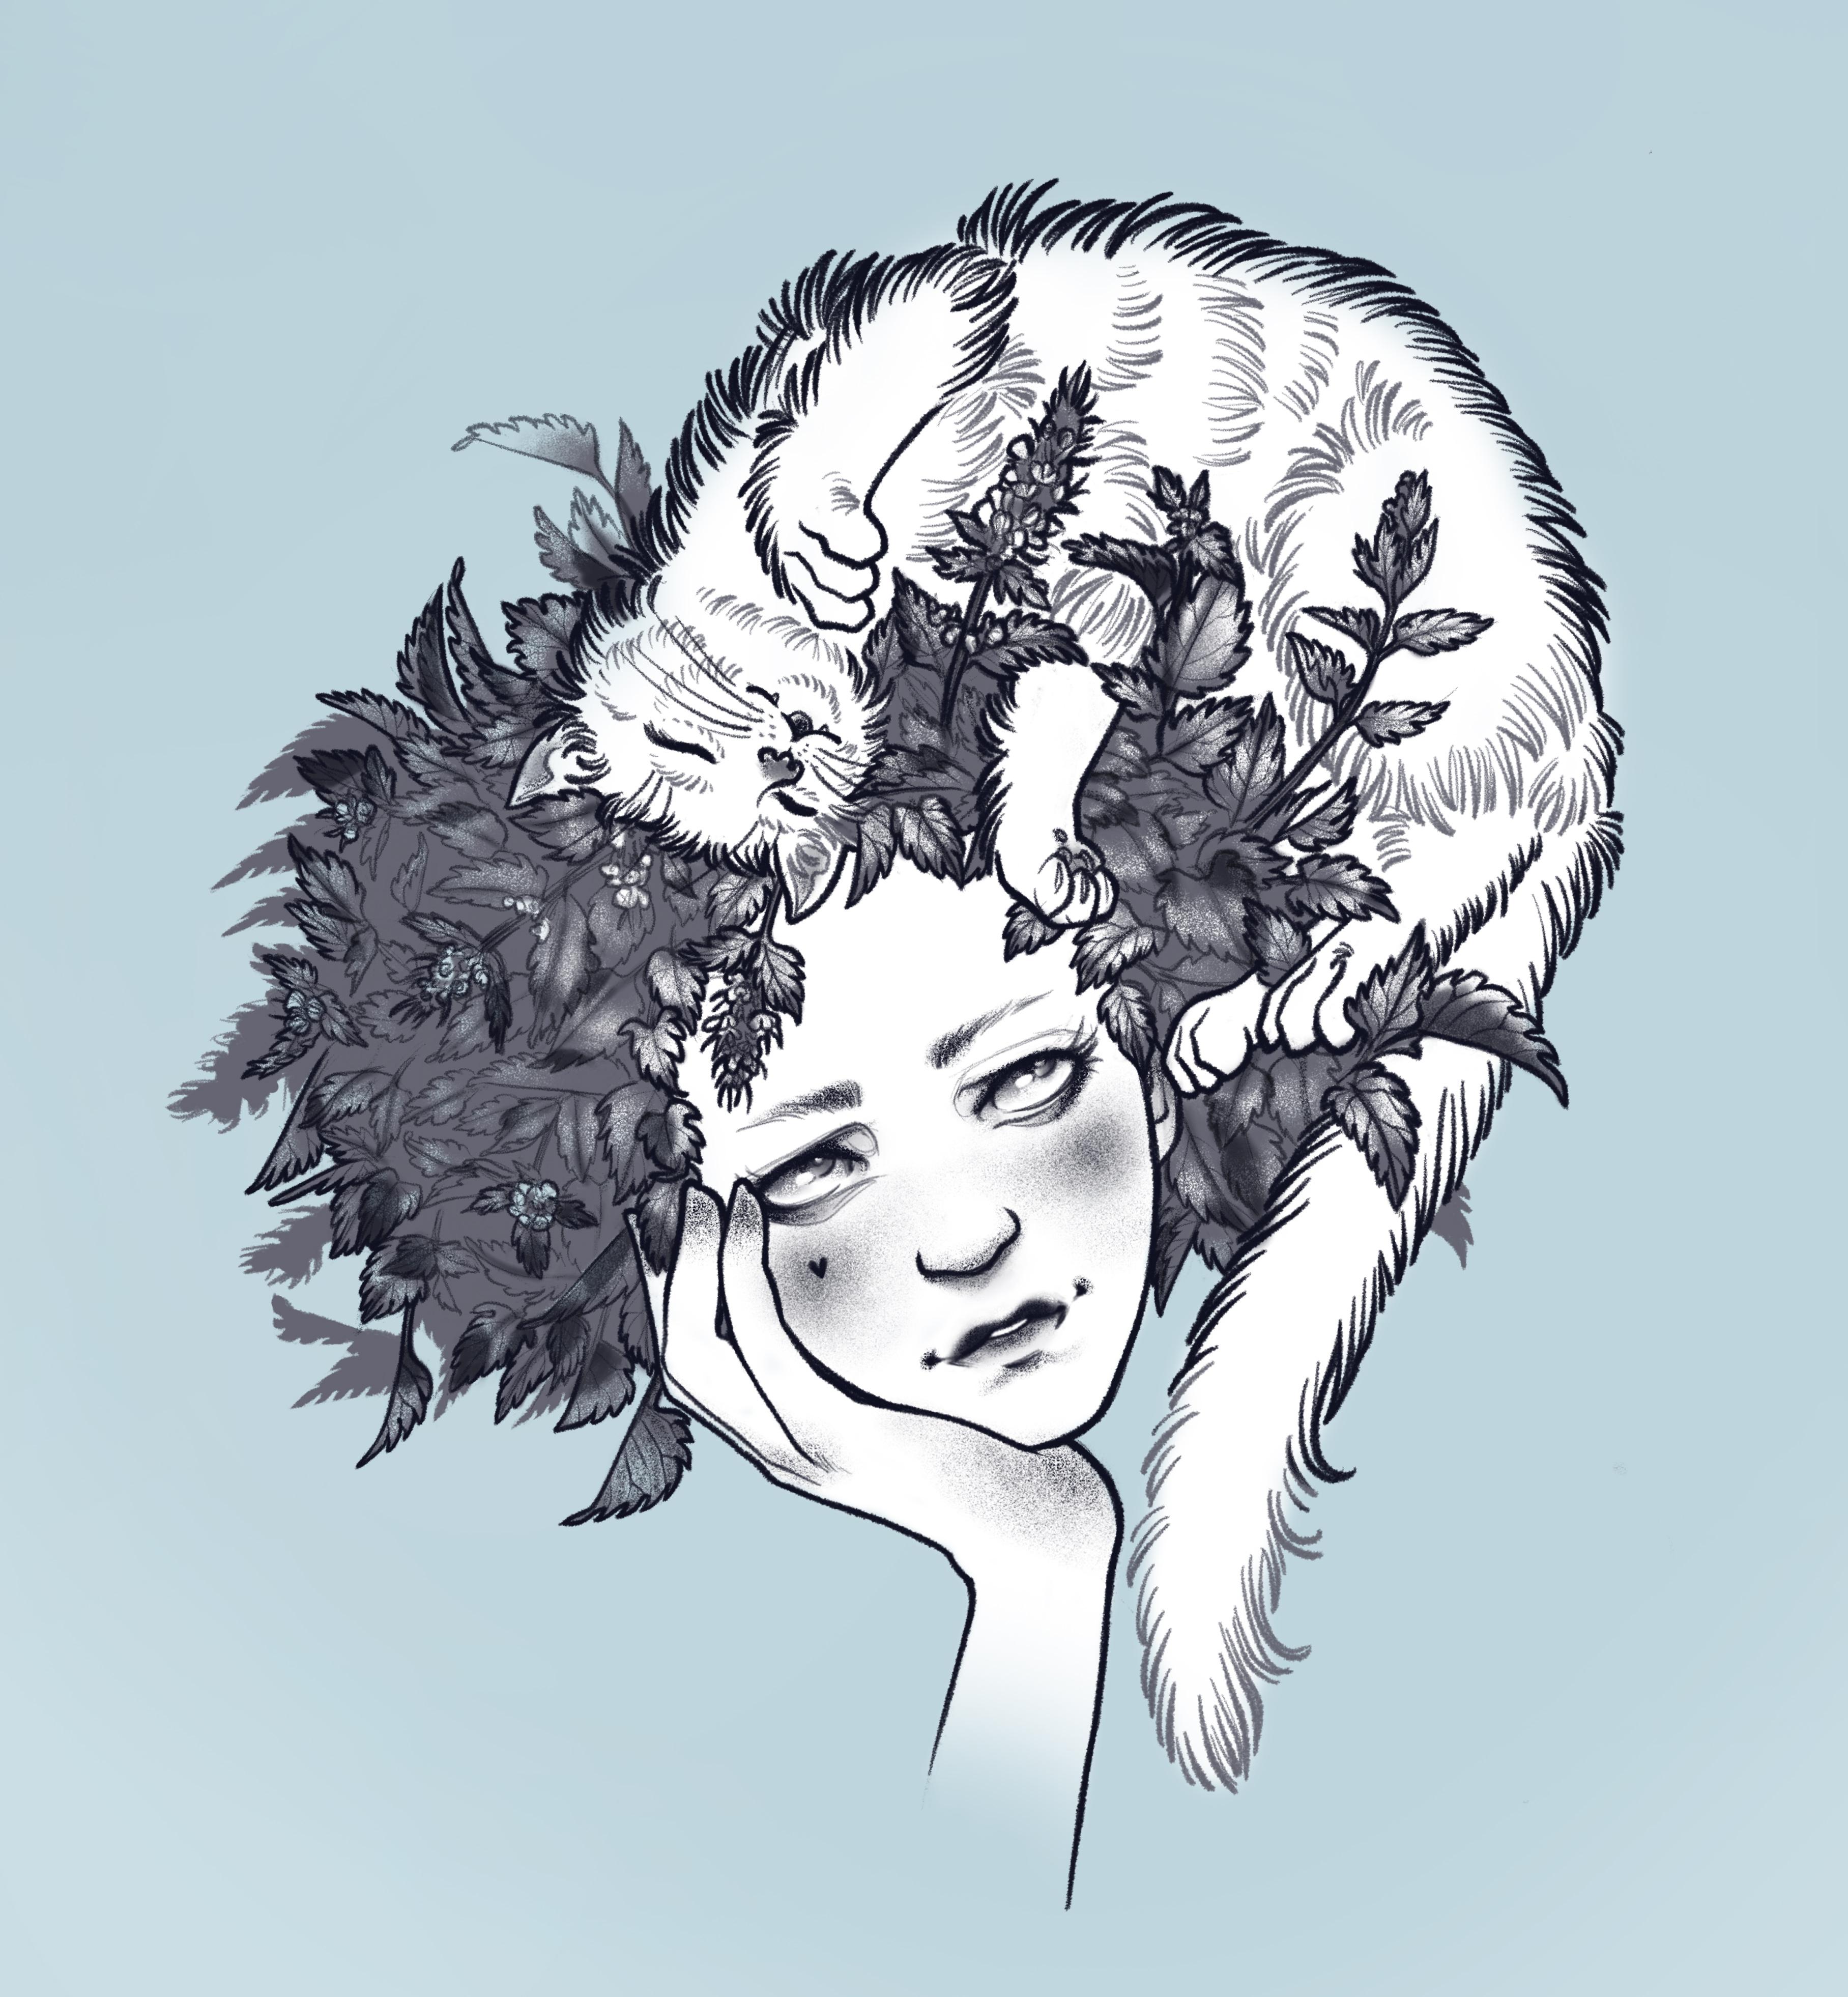 Catnip Lady by Natasha Tsozik